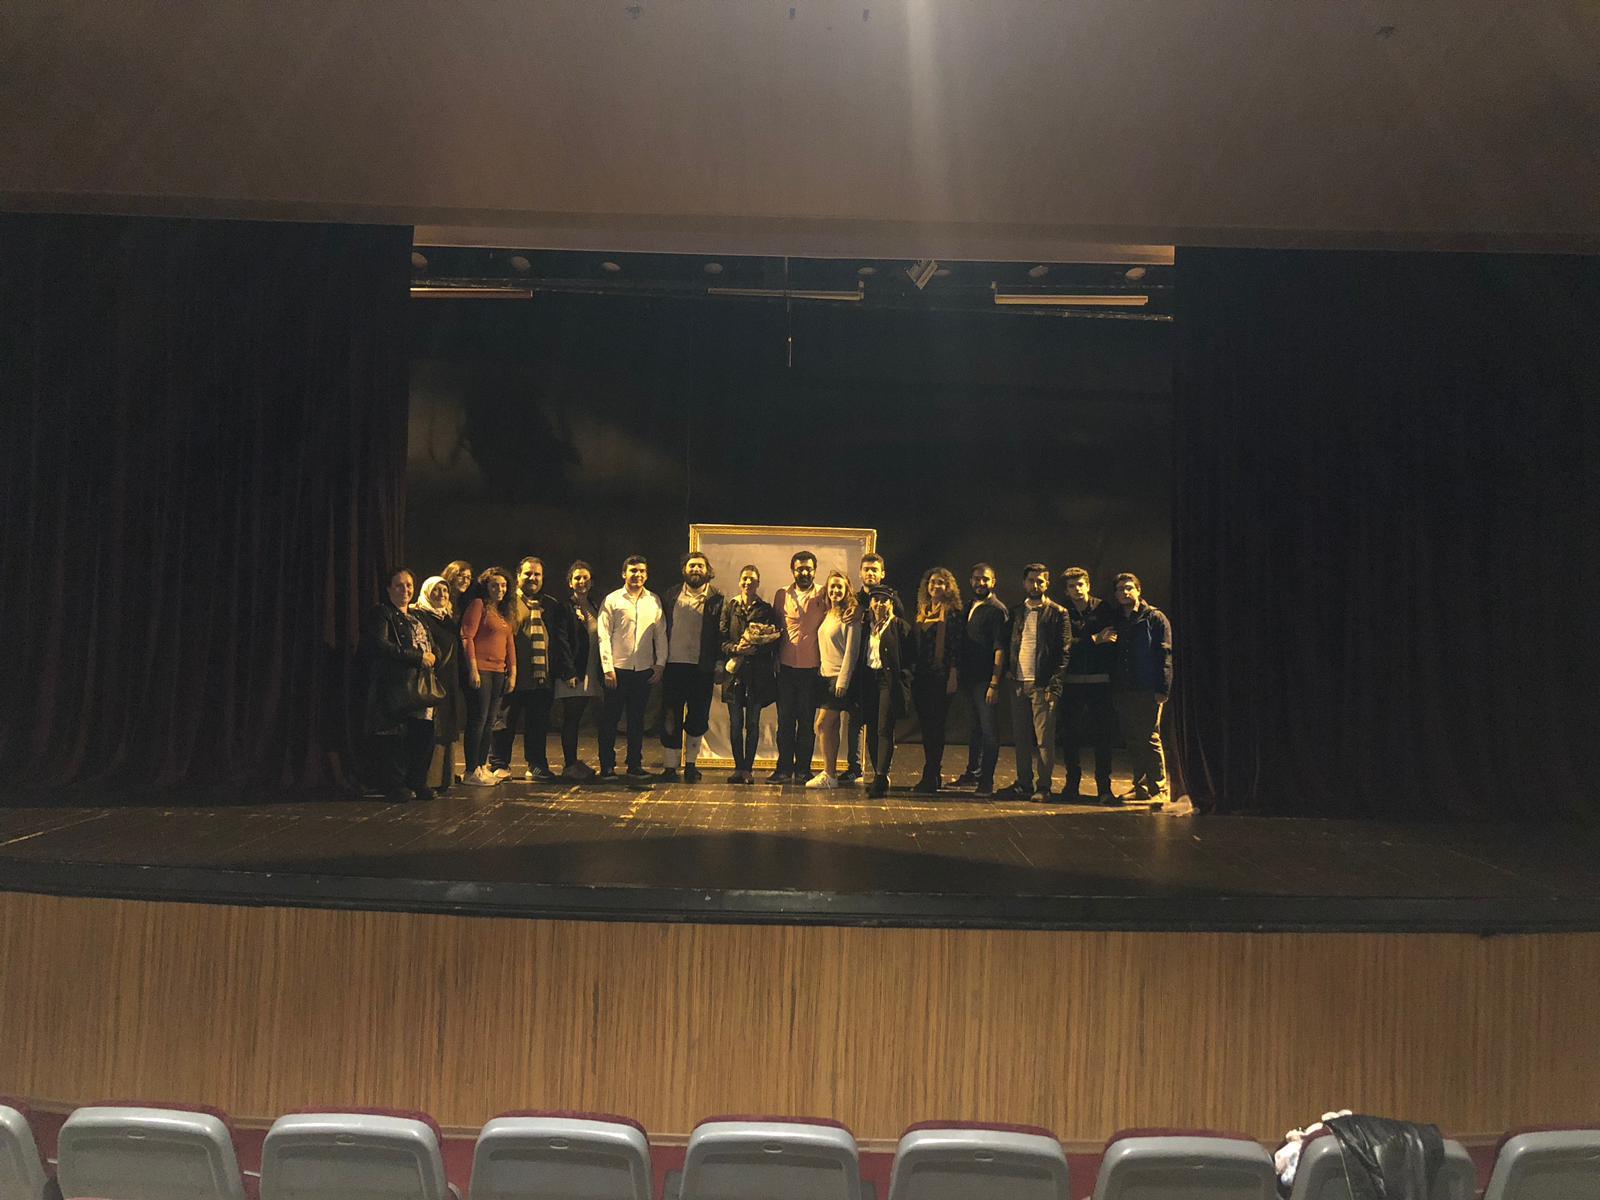 20.10.2018 / Suç Makinesi Tiyatro Gösterimi